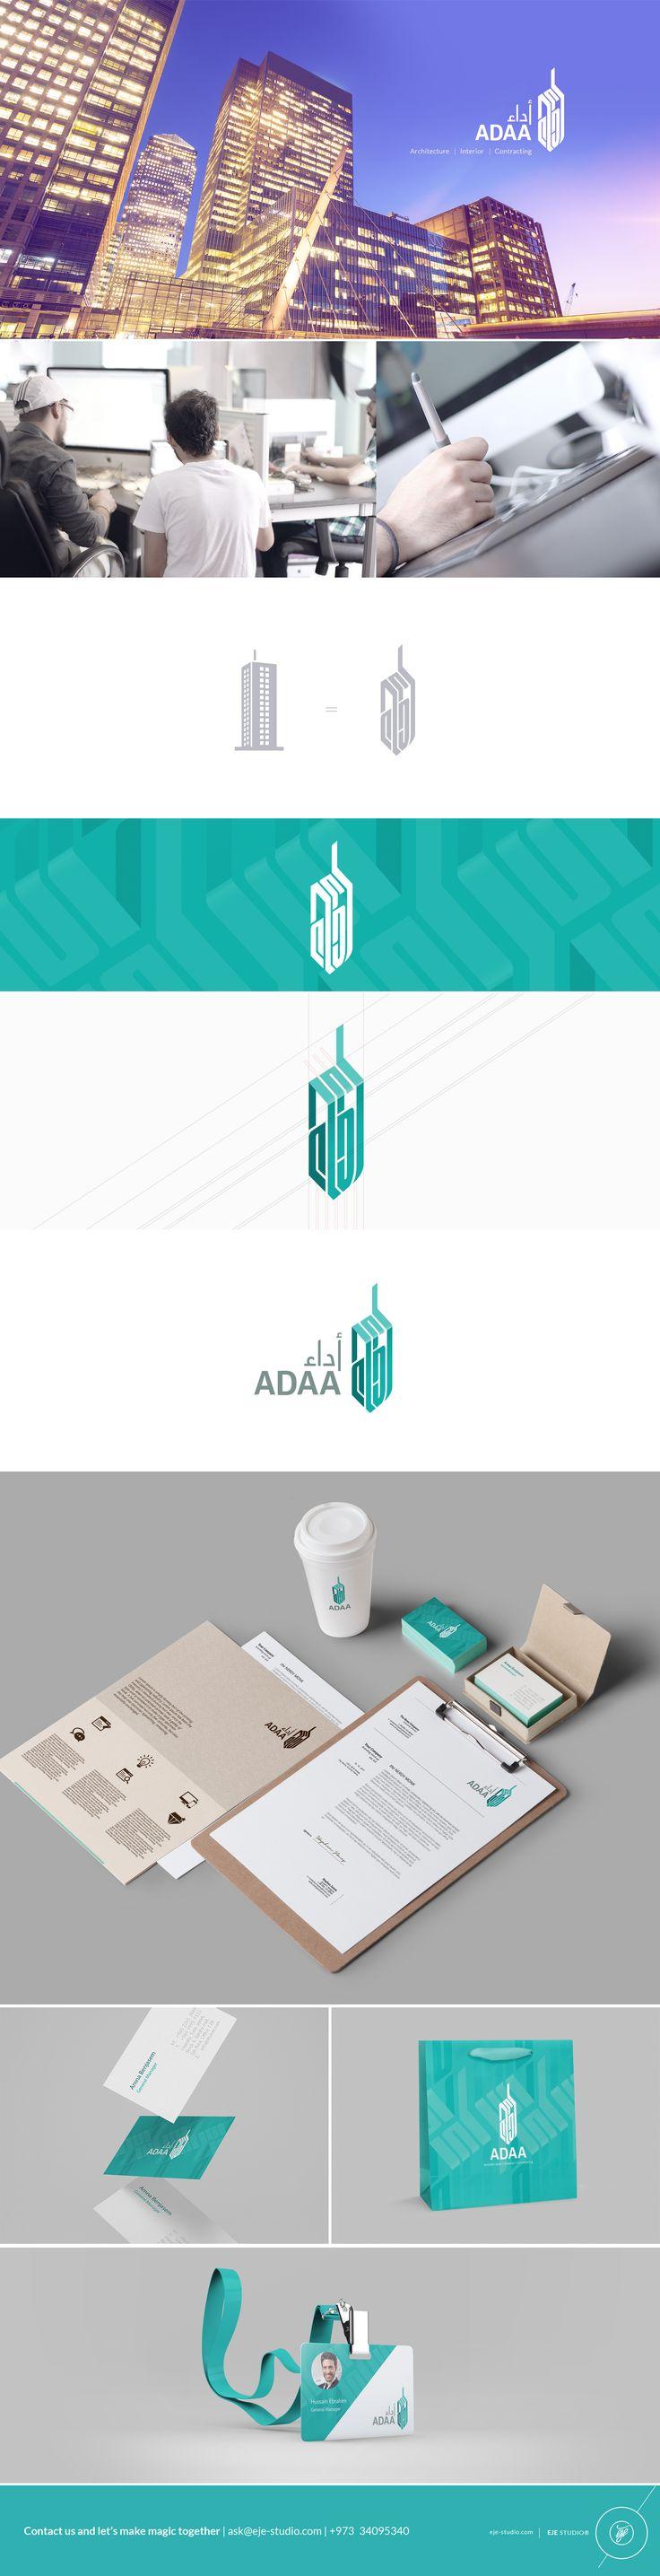 eje Studio®   EBRAHIM JAFFAR T: +97334095340 ask@eje-studio.com www.eje-studio.com  eje studio, ebrahim jaffar, bahraini designer , arabic logo, boxobia, oman , qatar , bahrain , saudi , uae , modern arabic calligraphy , logo colorful , wissam shawkat logos , logonon , best arabic logos , iraq, amazing arabic, sanabis , Kuwait, amazing arabic logos , arab calligraphy , branding agency